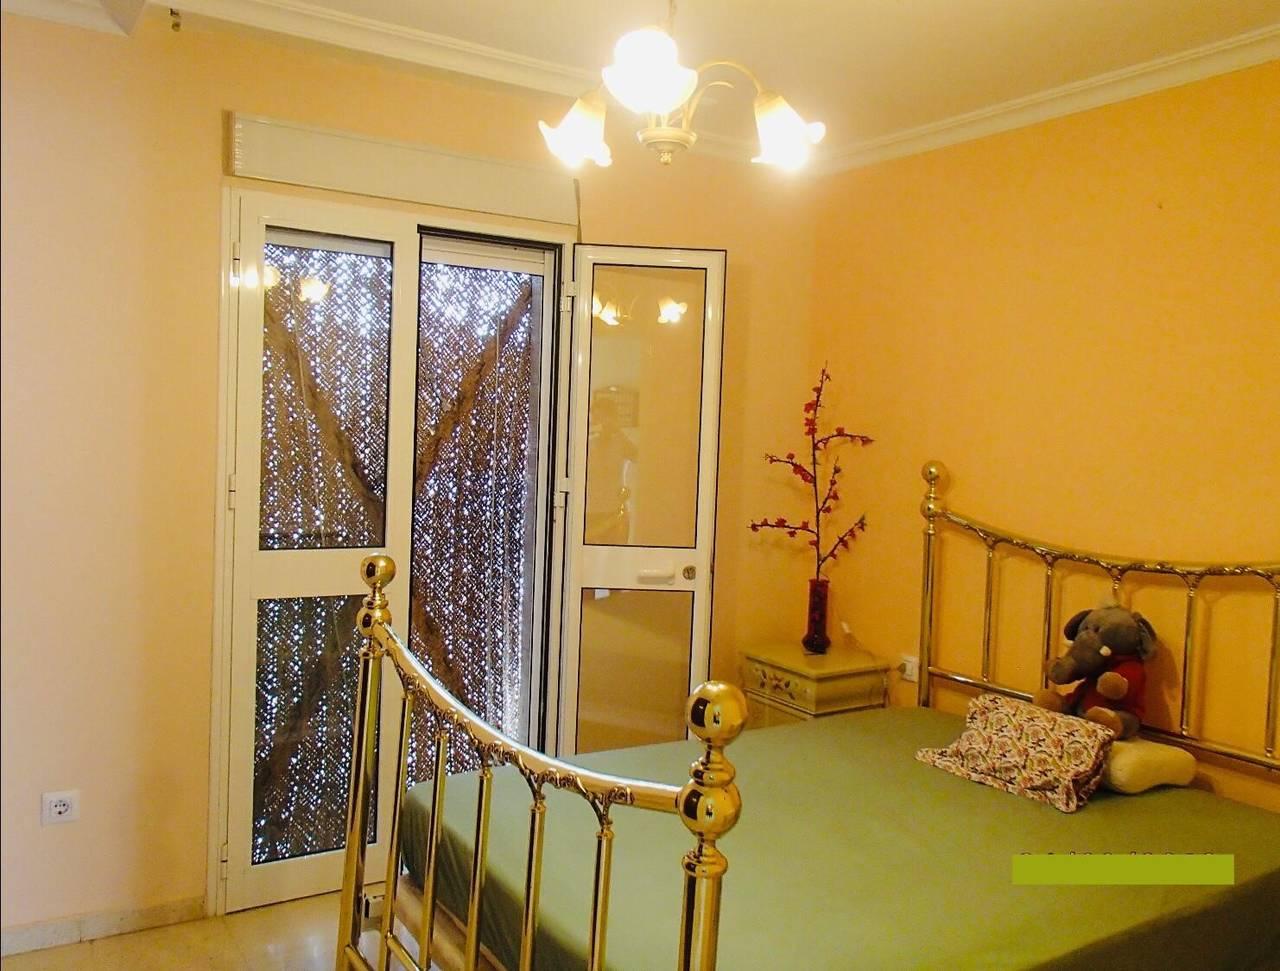 Particular alquila/vende preciosa casa adosada esquinera Coria del Rio  - Foto 2